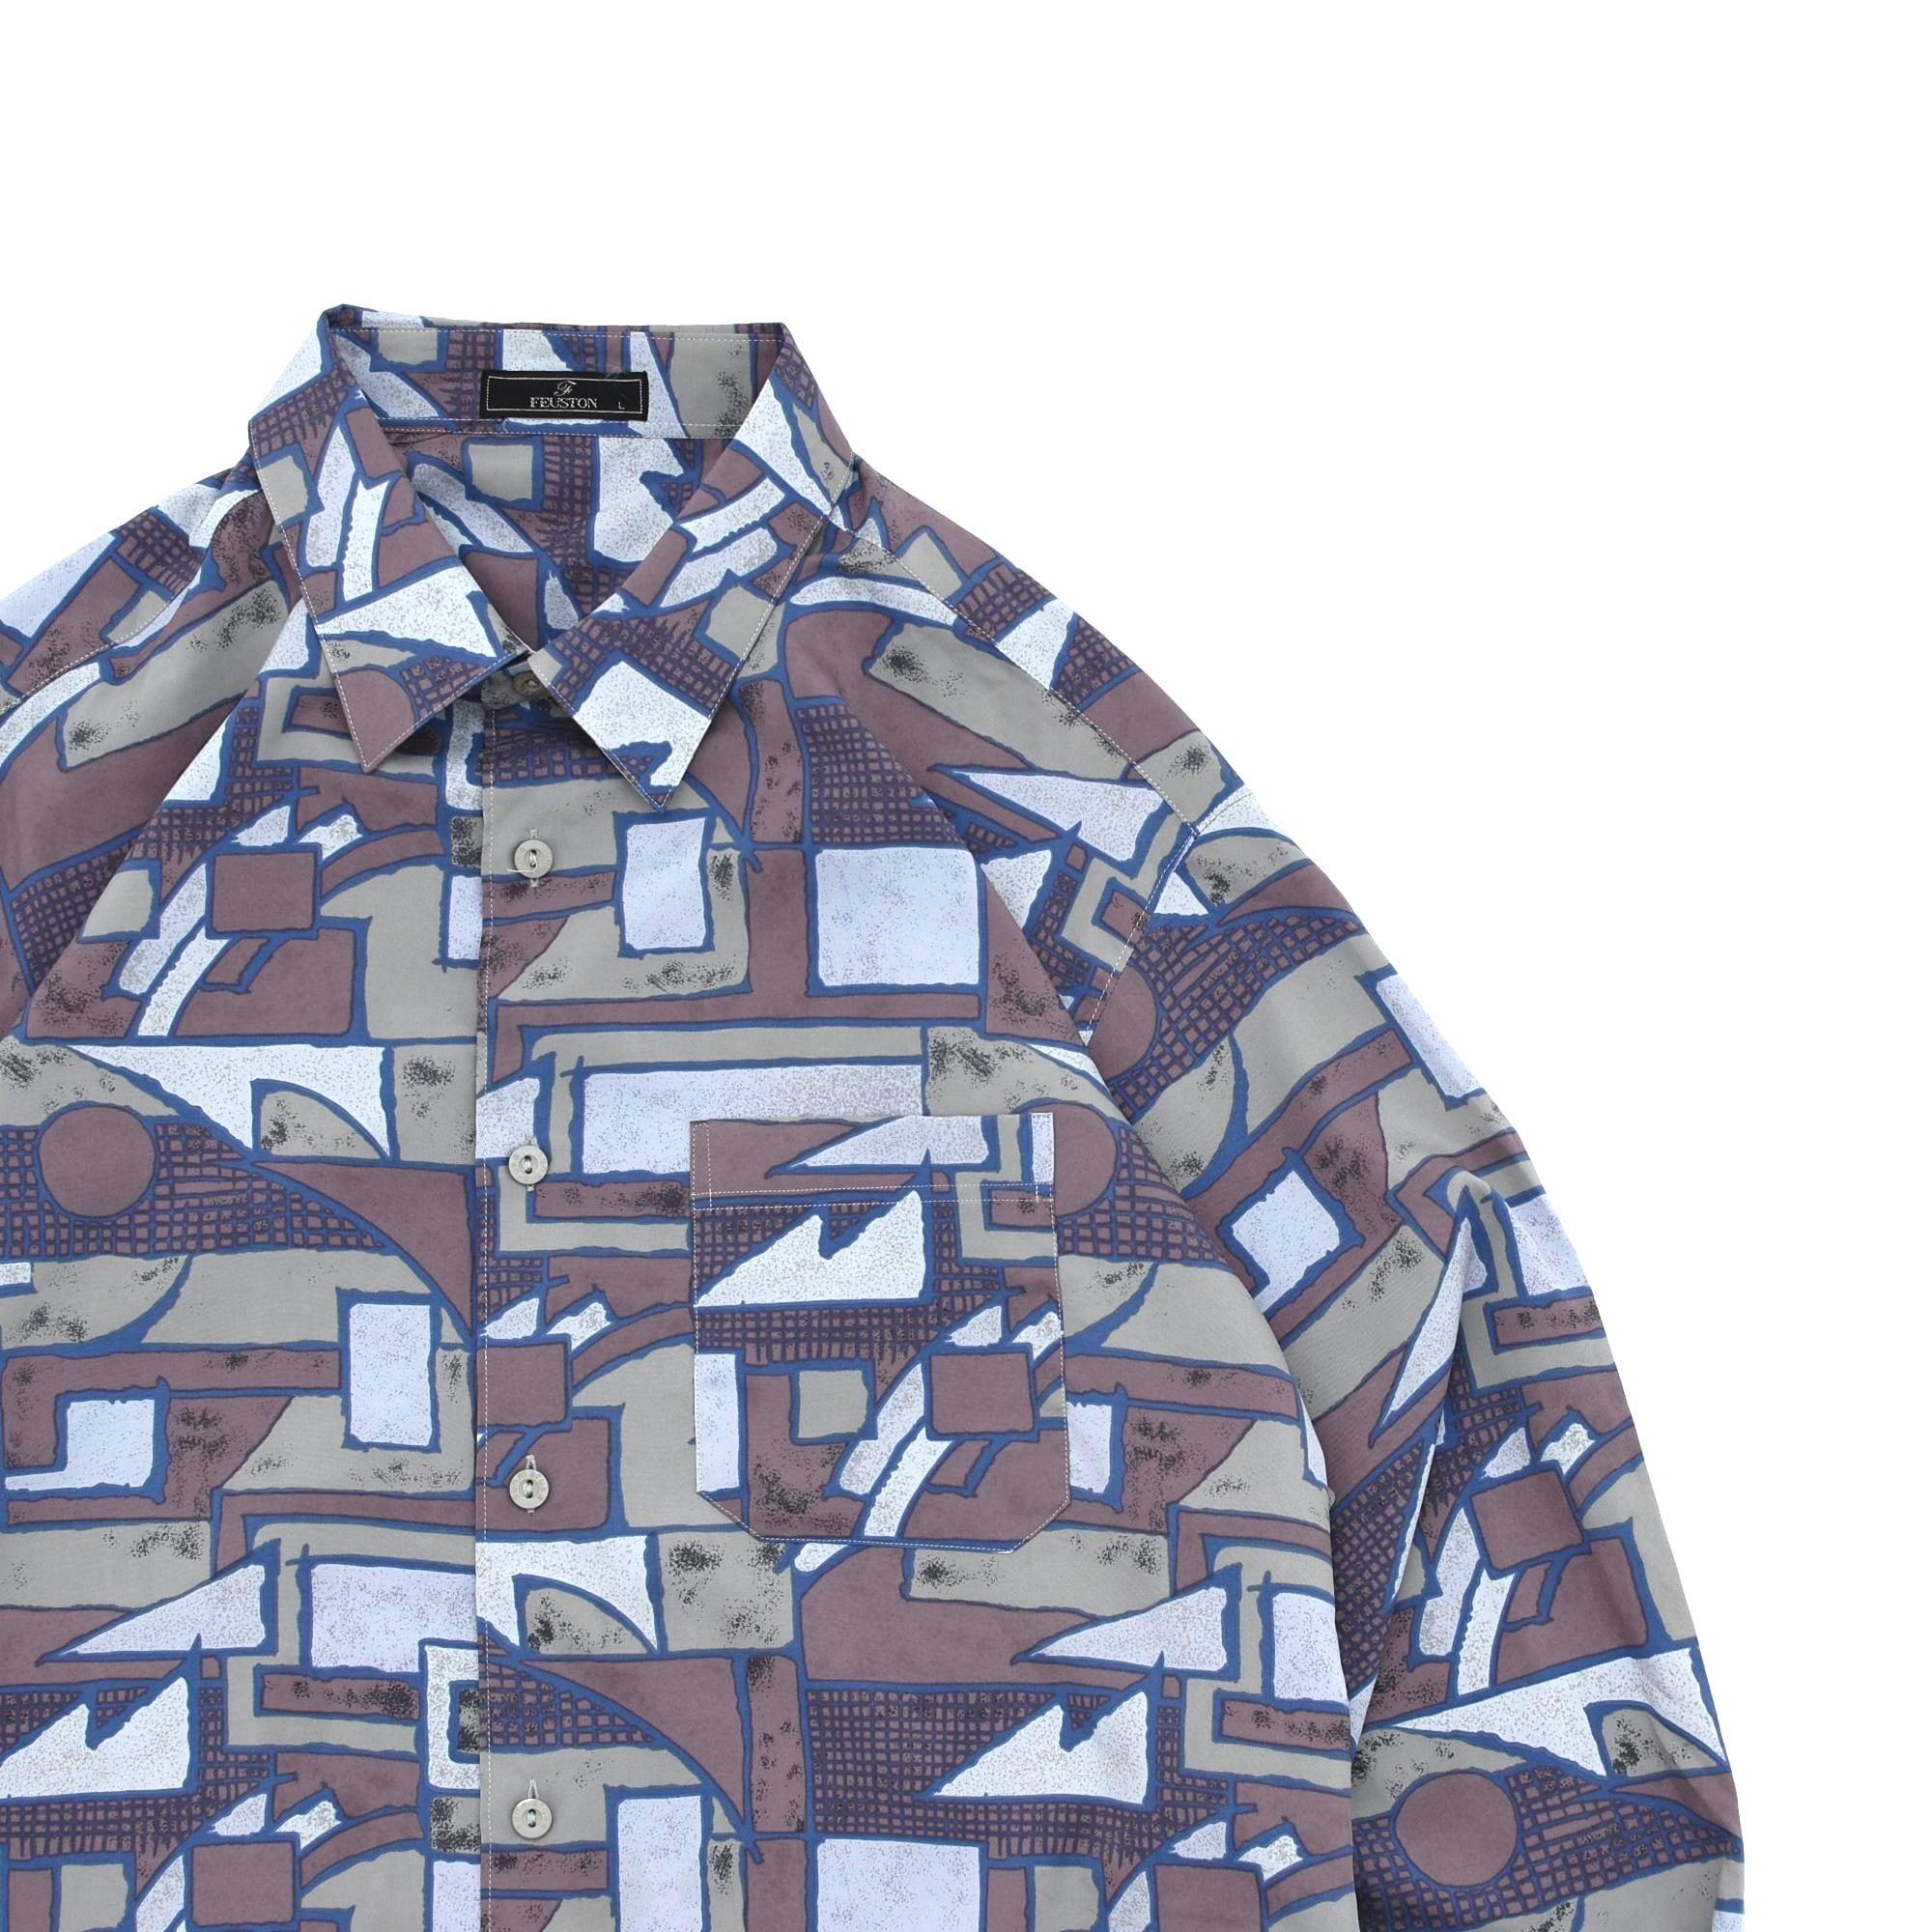 Geometric full pattern polyester shirt